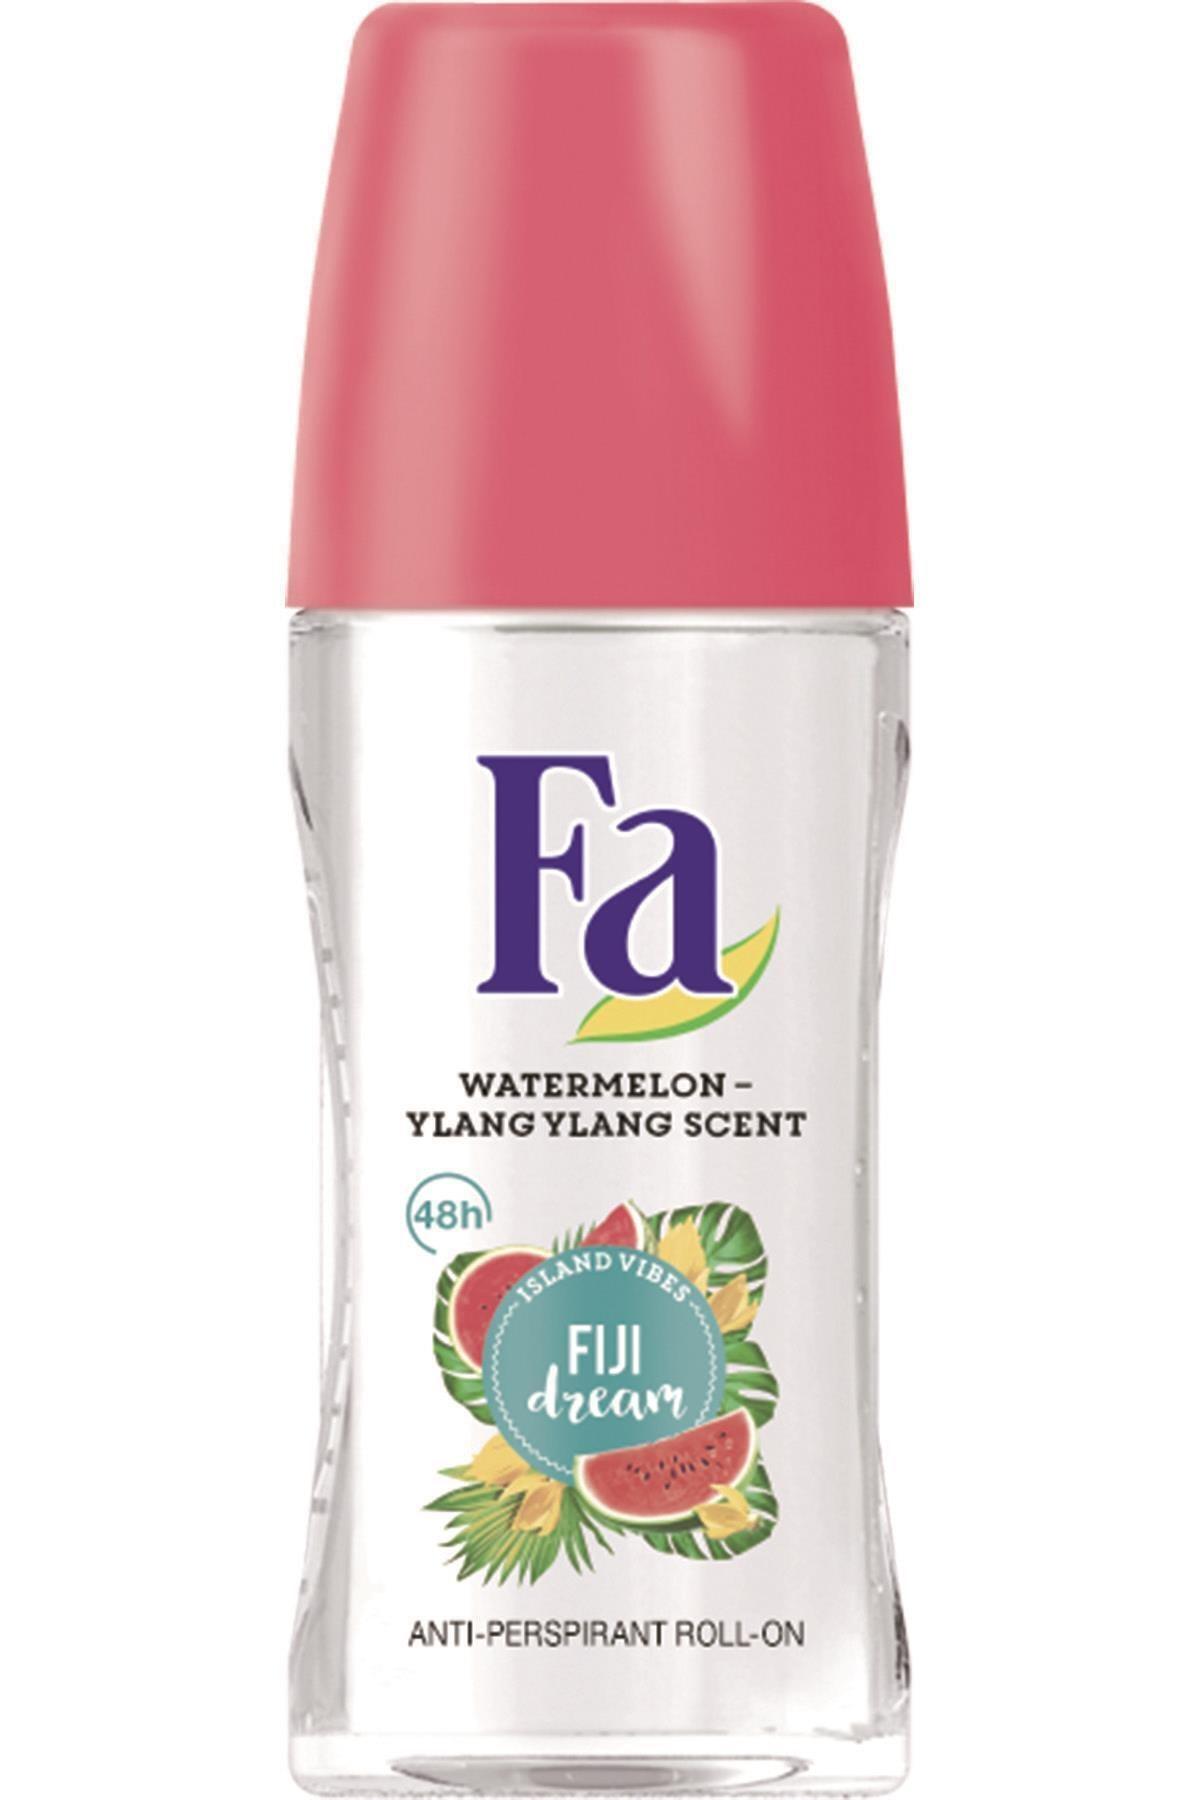 Fa Spray Fiji Dreams Roll-On 50 ml 1